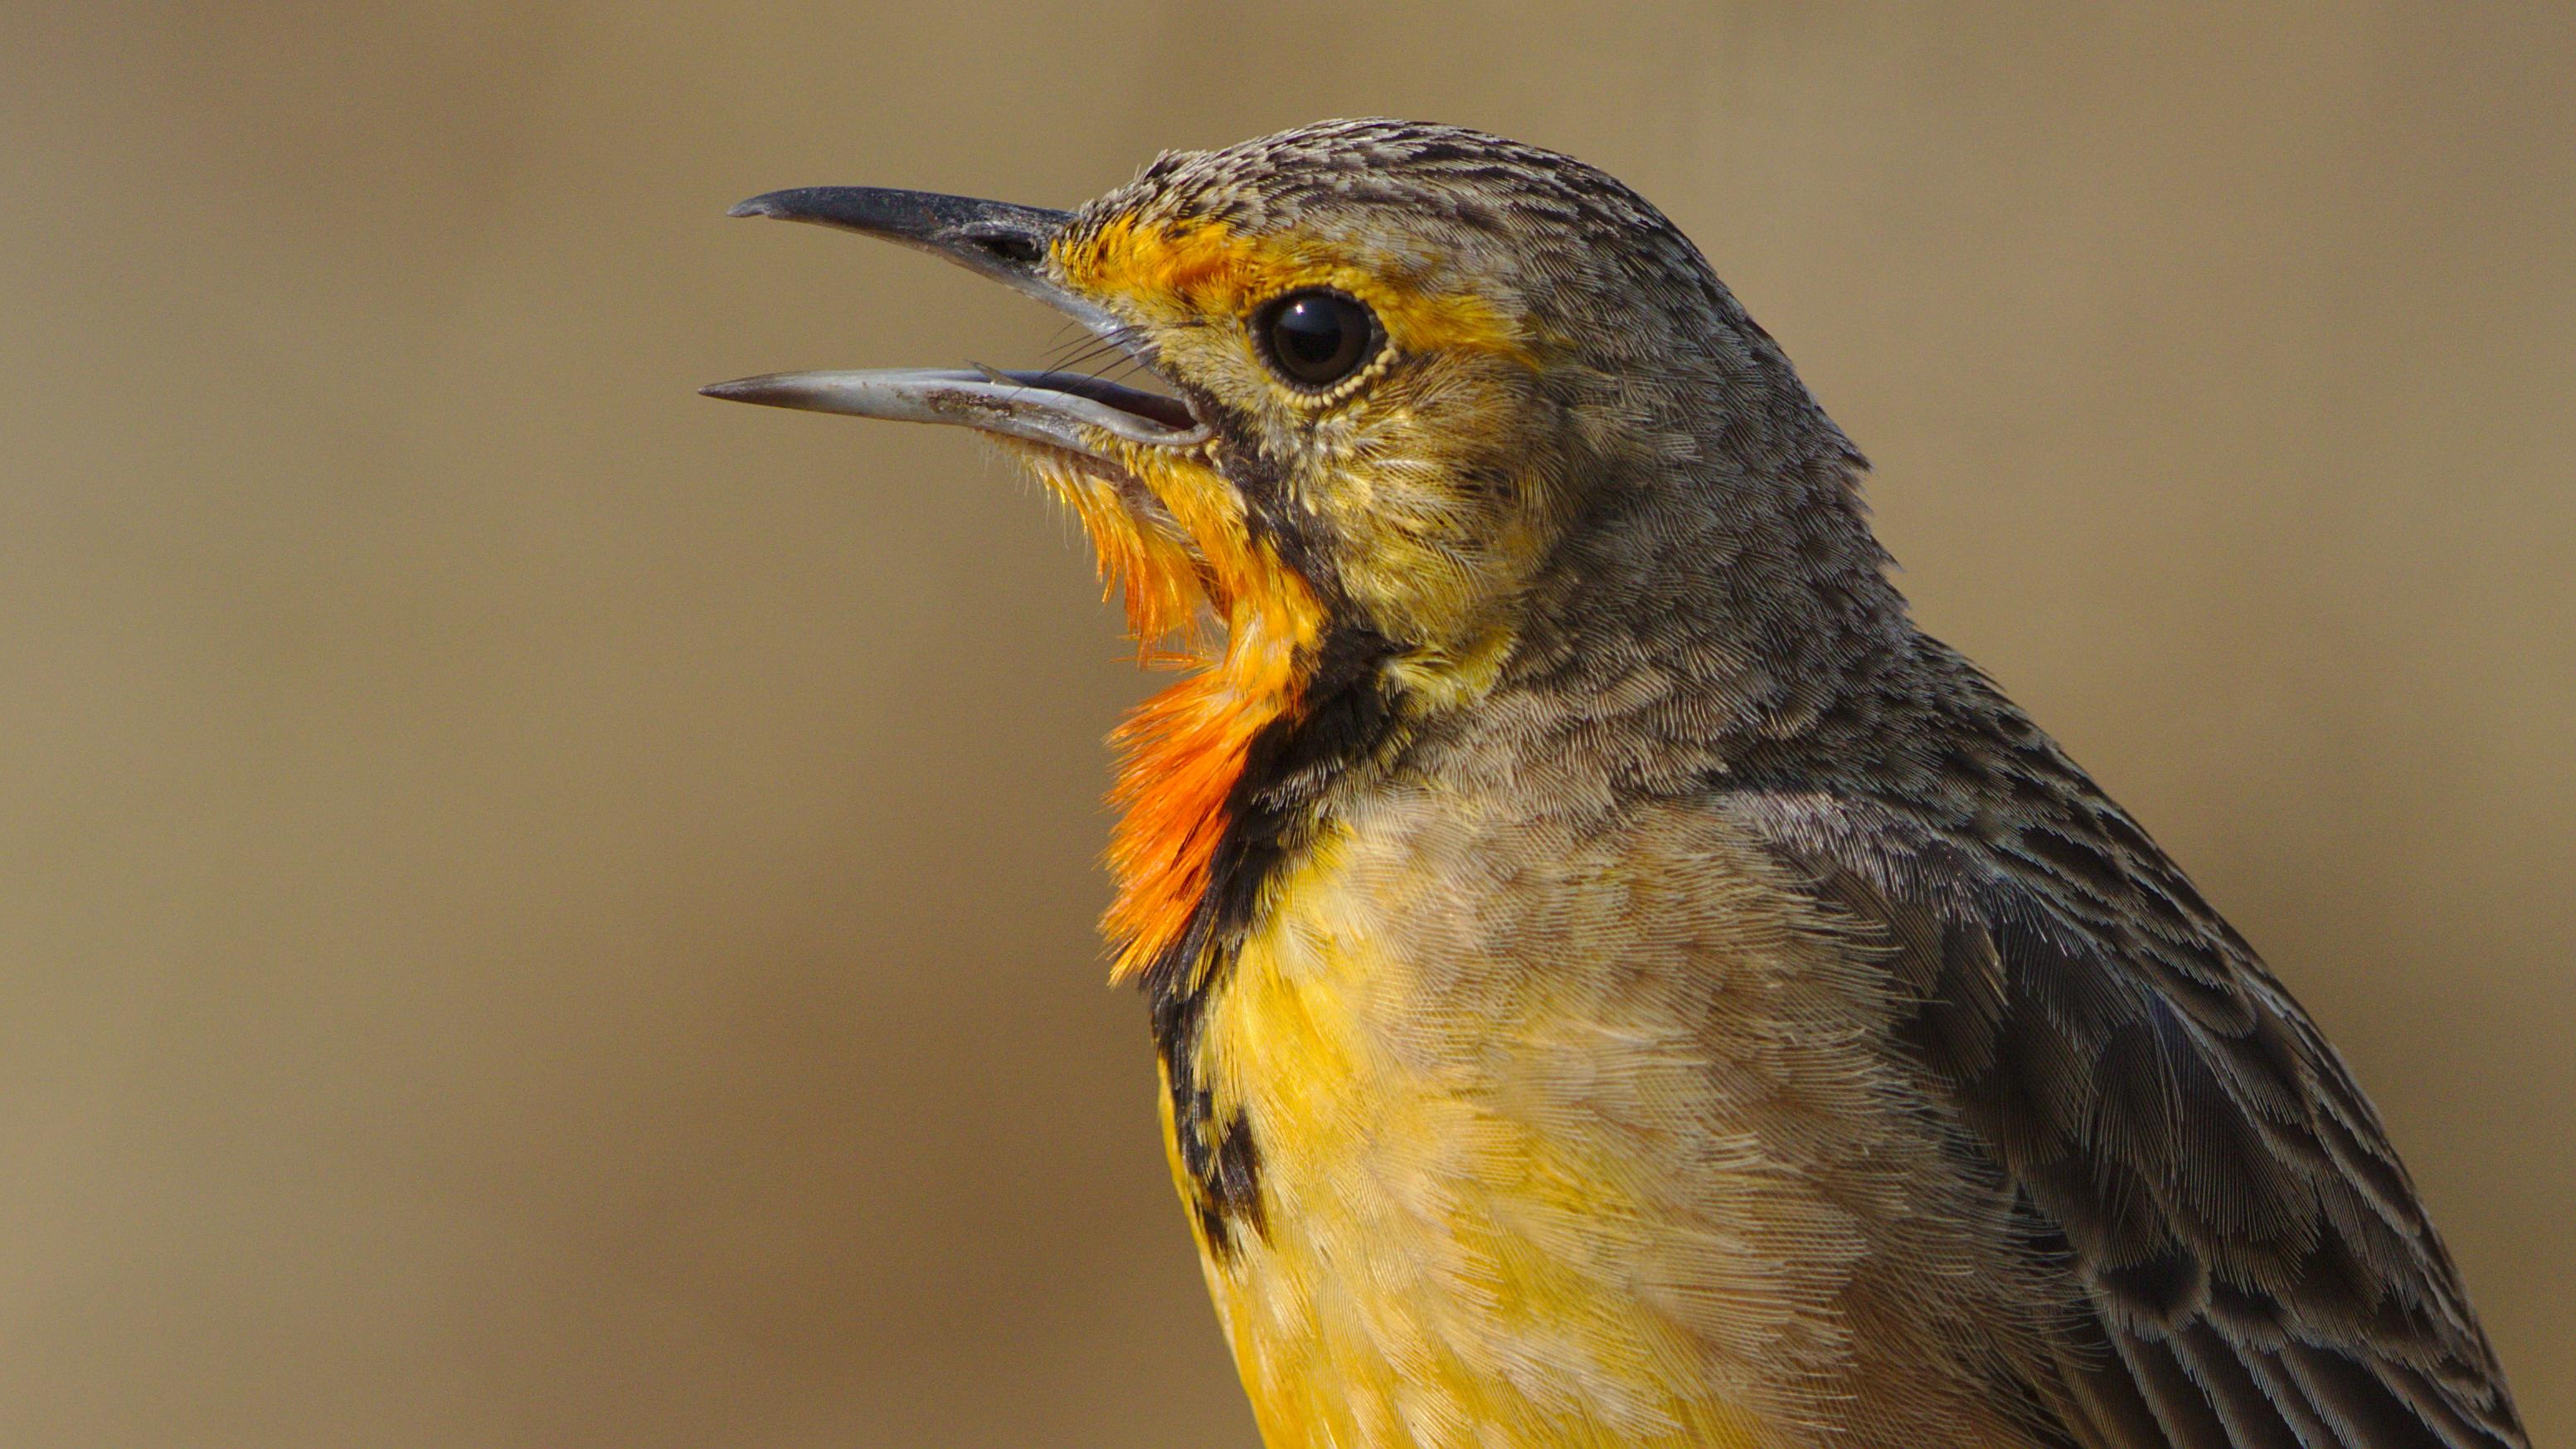 File:Cape Longclaw or Orange-throated Longclaw, Macronyx capensis at  Ezemvelo Nature Reserve